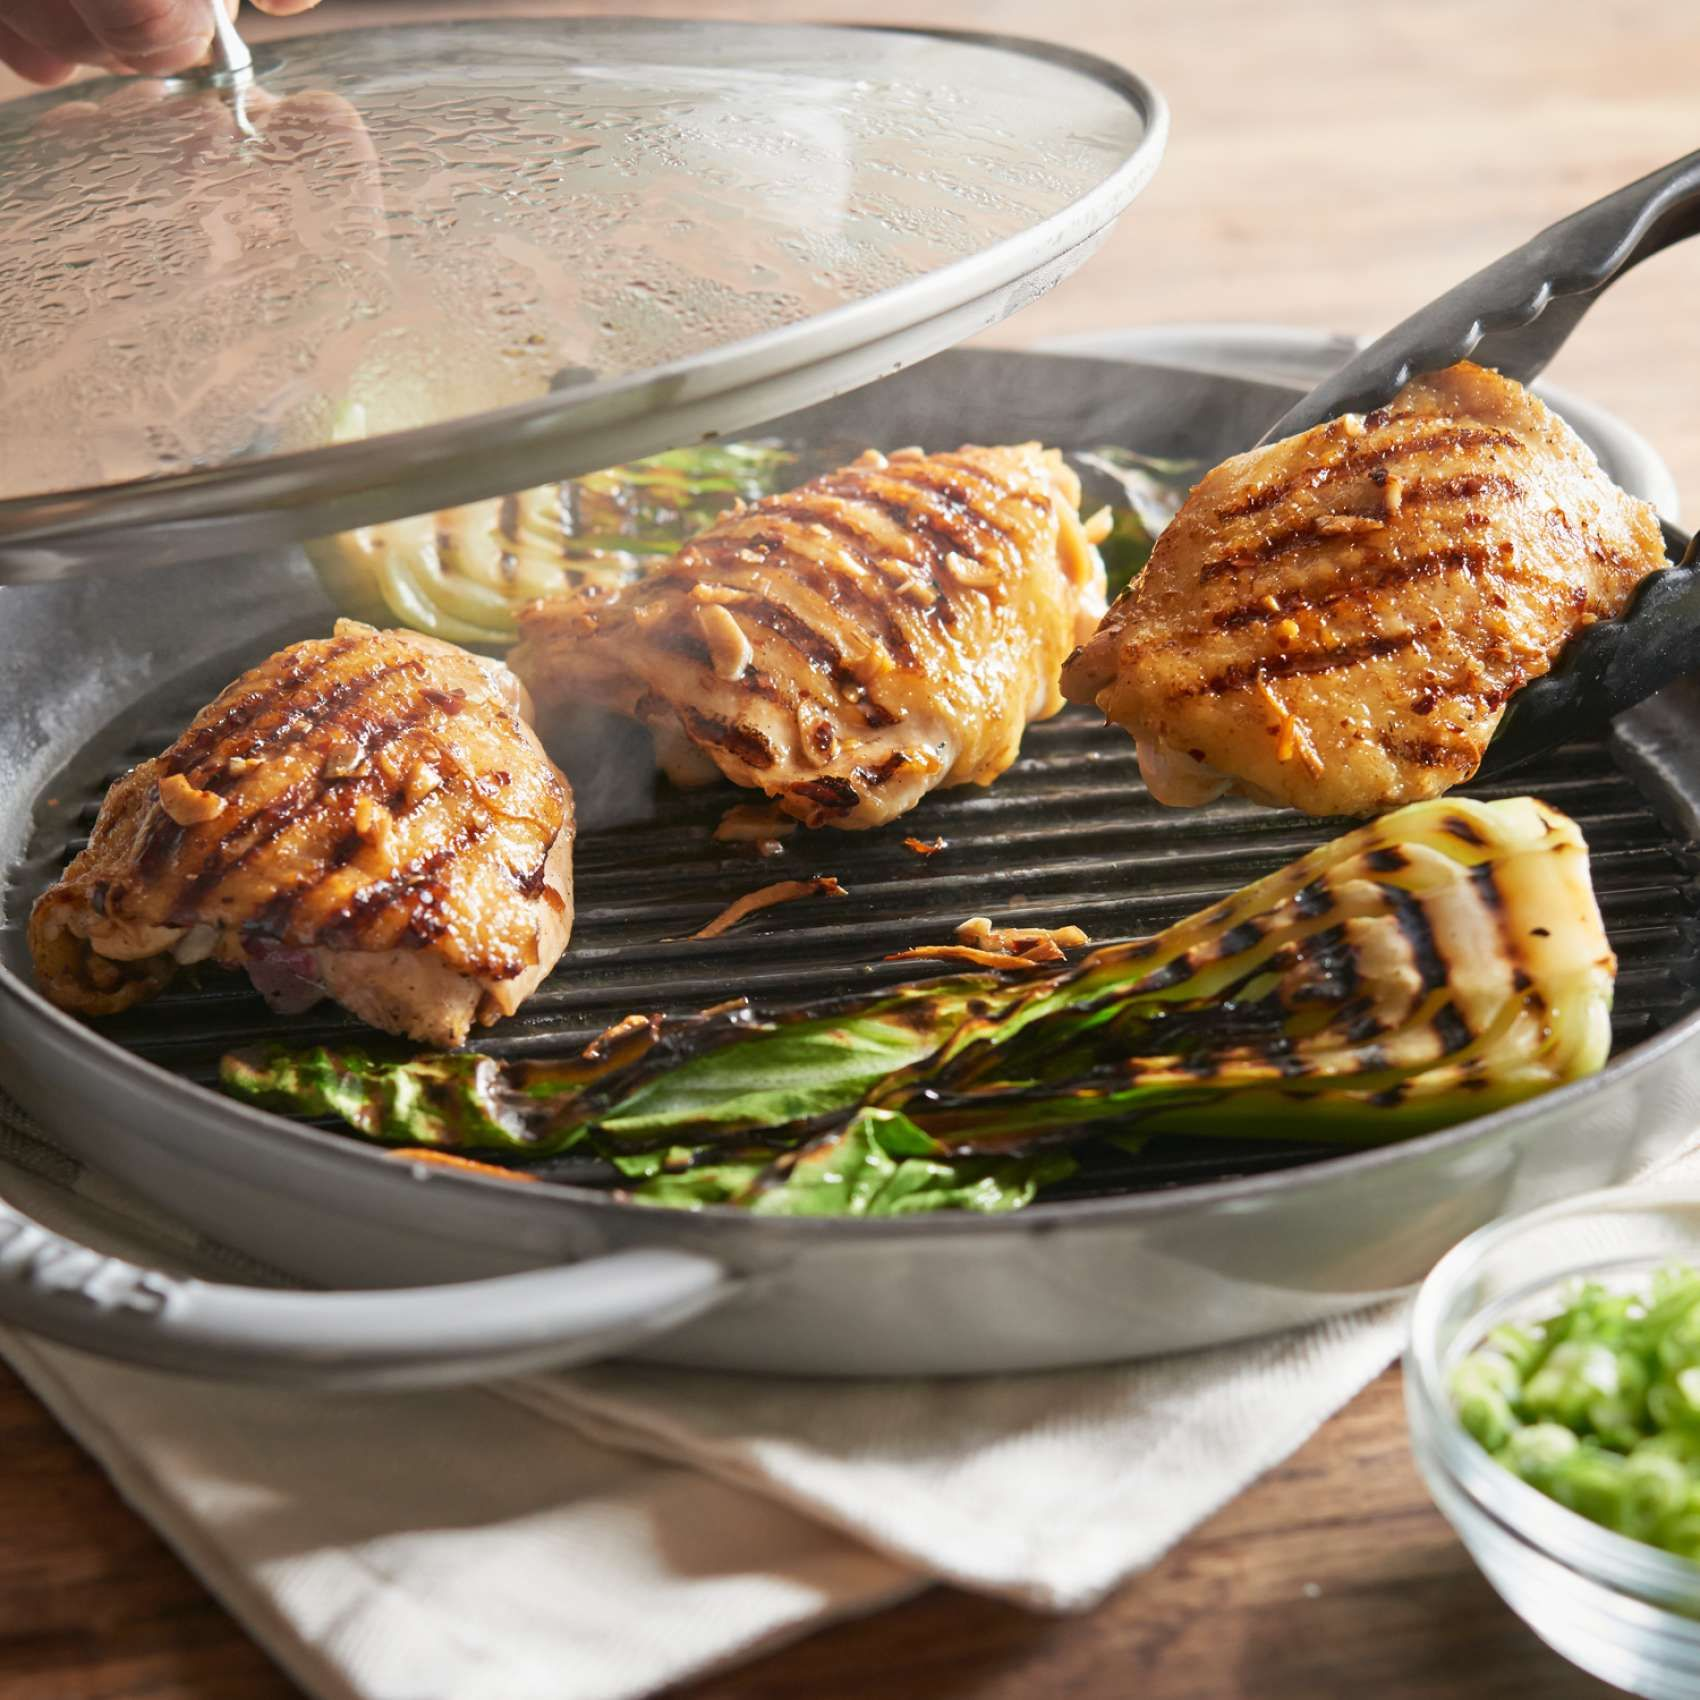 Staub Steam Grill 12 Quot Sur La Table Staub Recipe Grilling Food